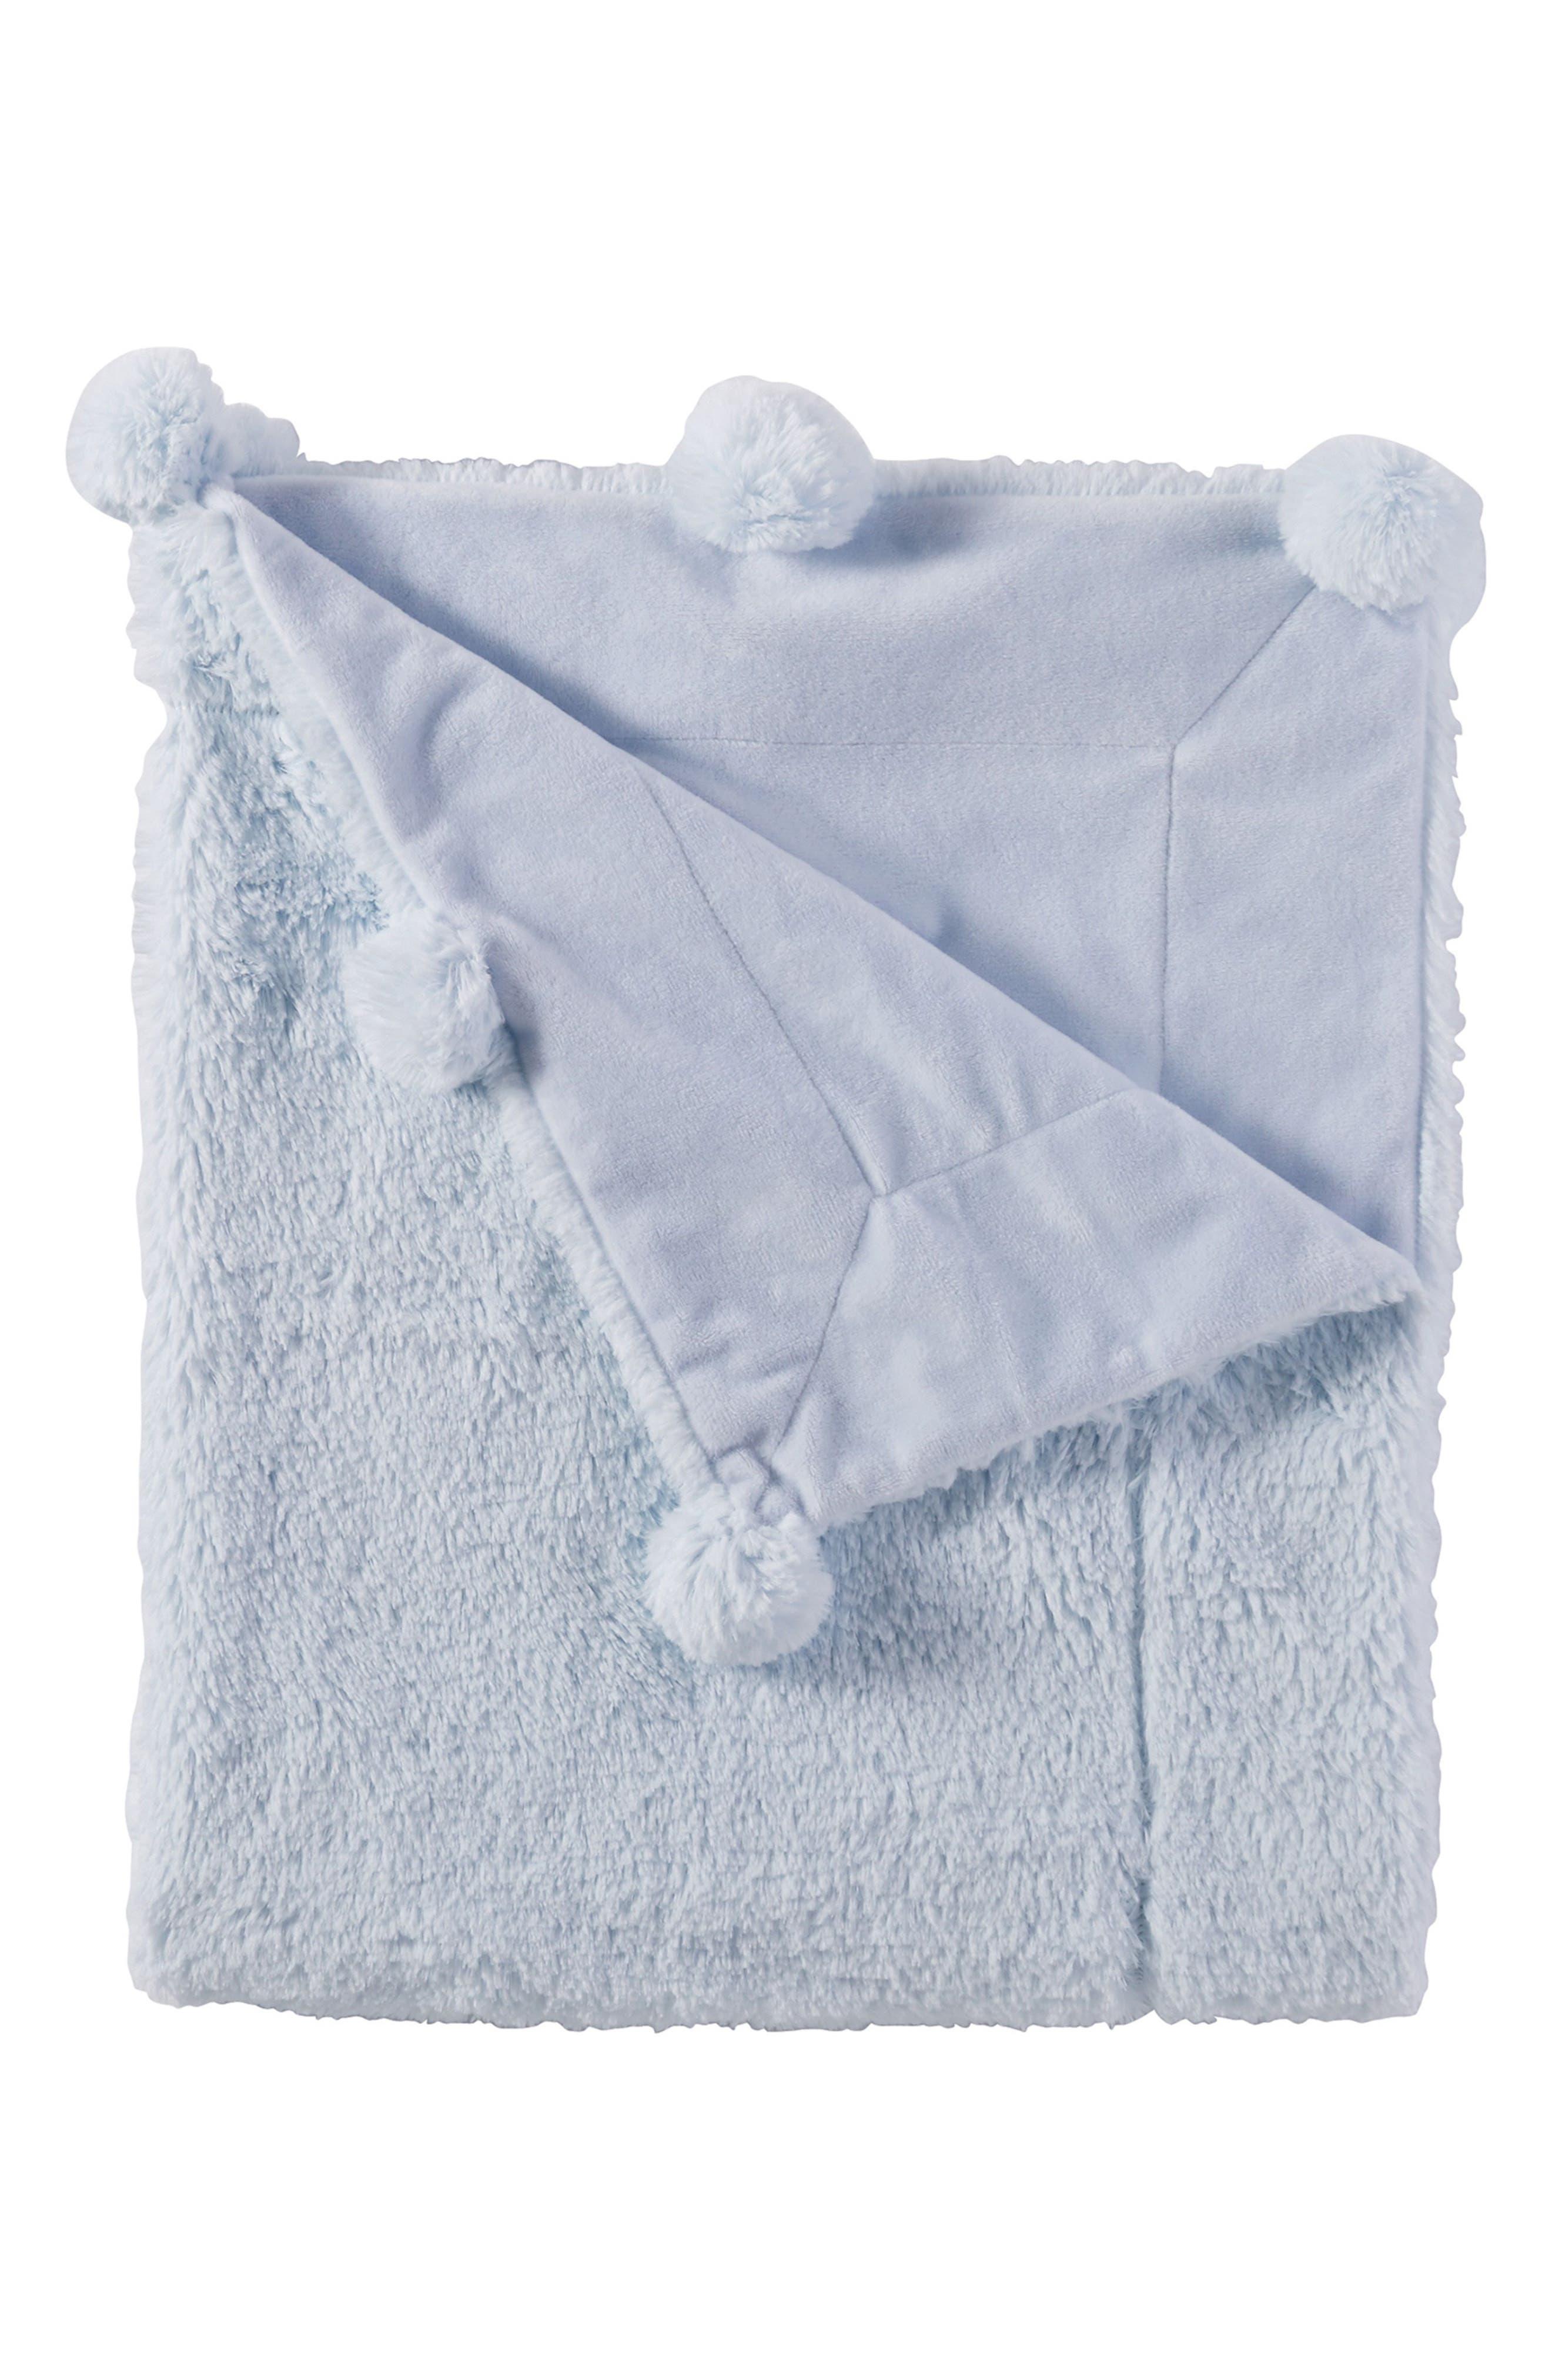 Pompom Receiving Blanket,                             Main thumbnail 1, color,                             400